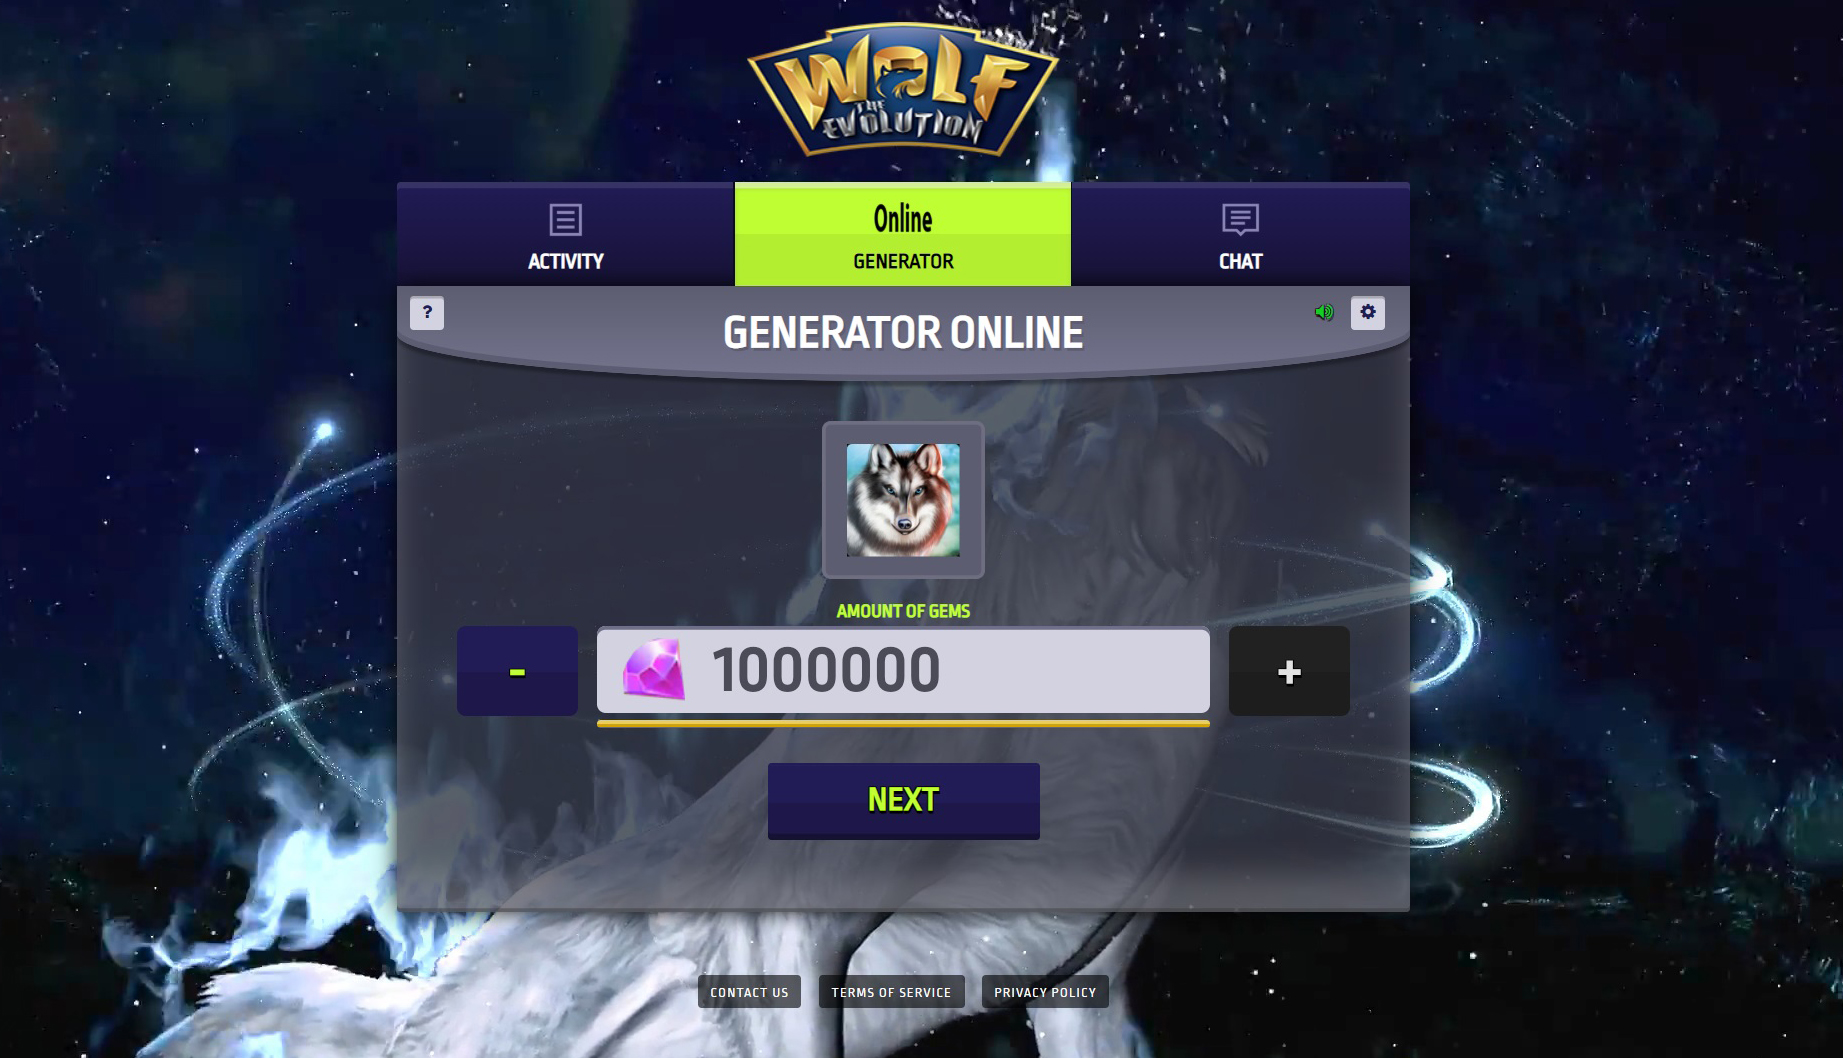 wolf-the-evolution-hack